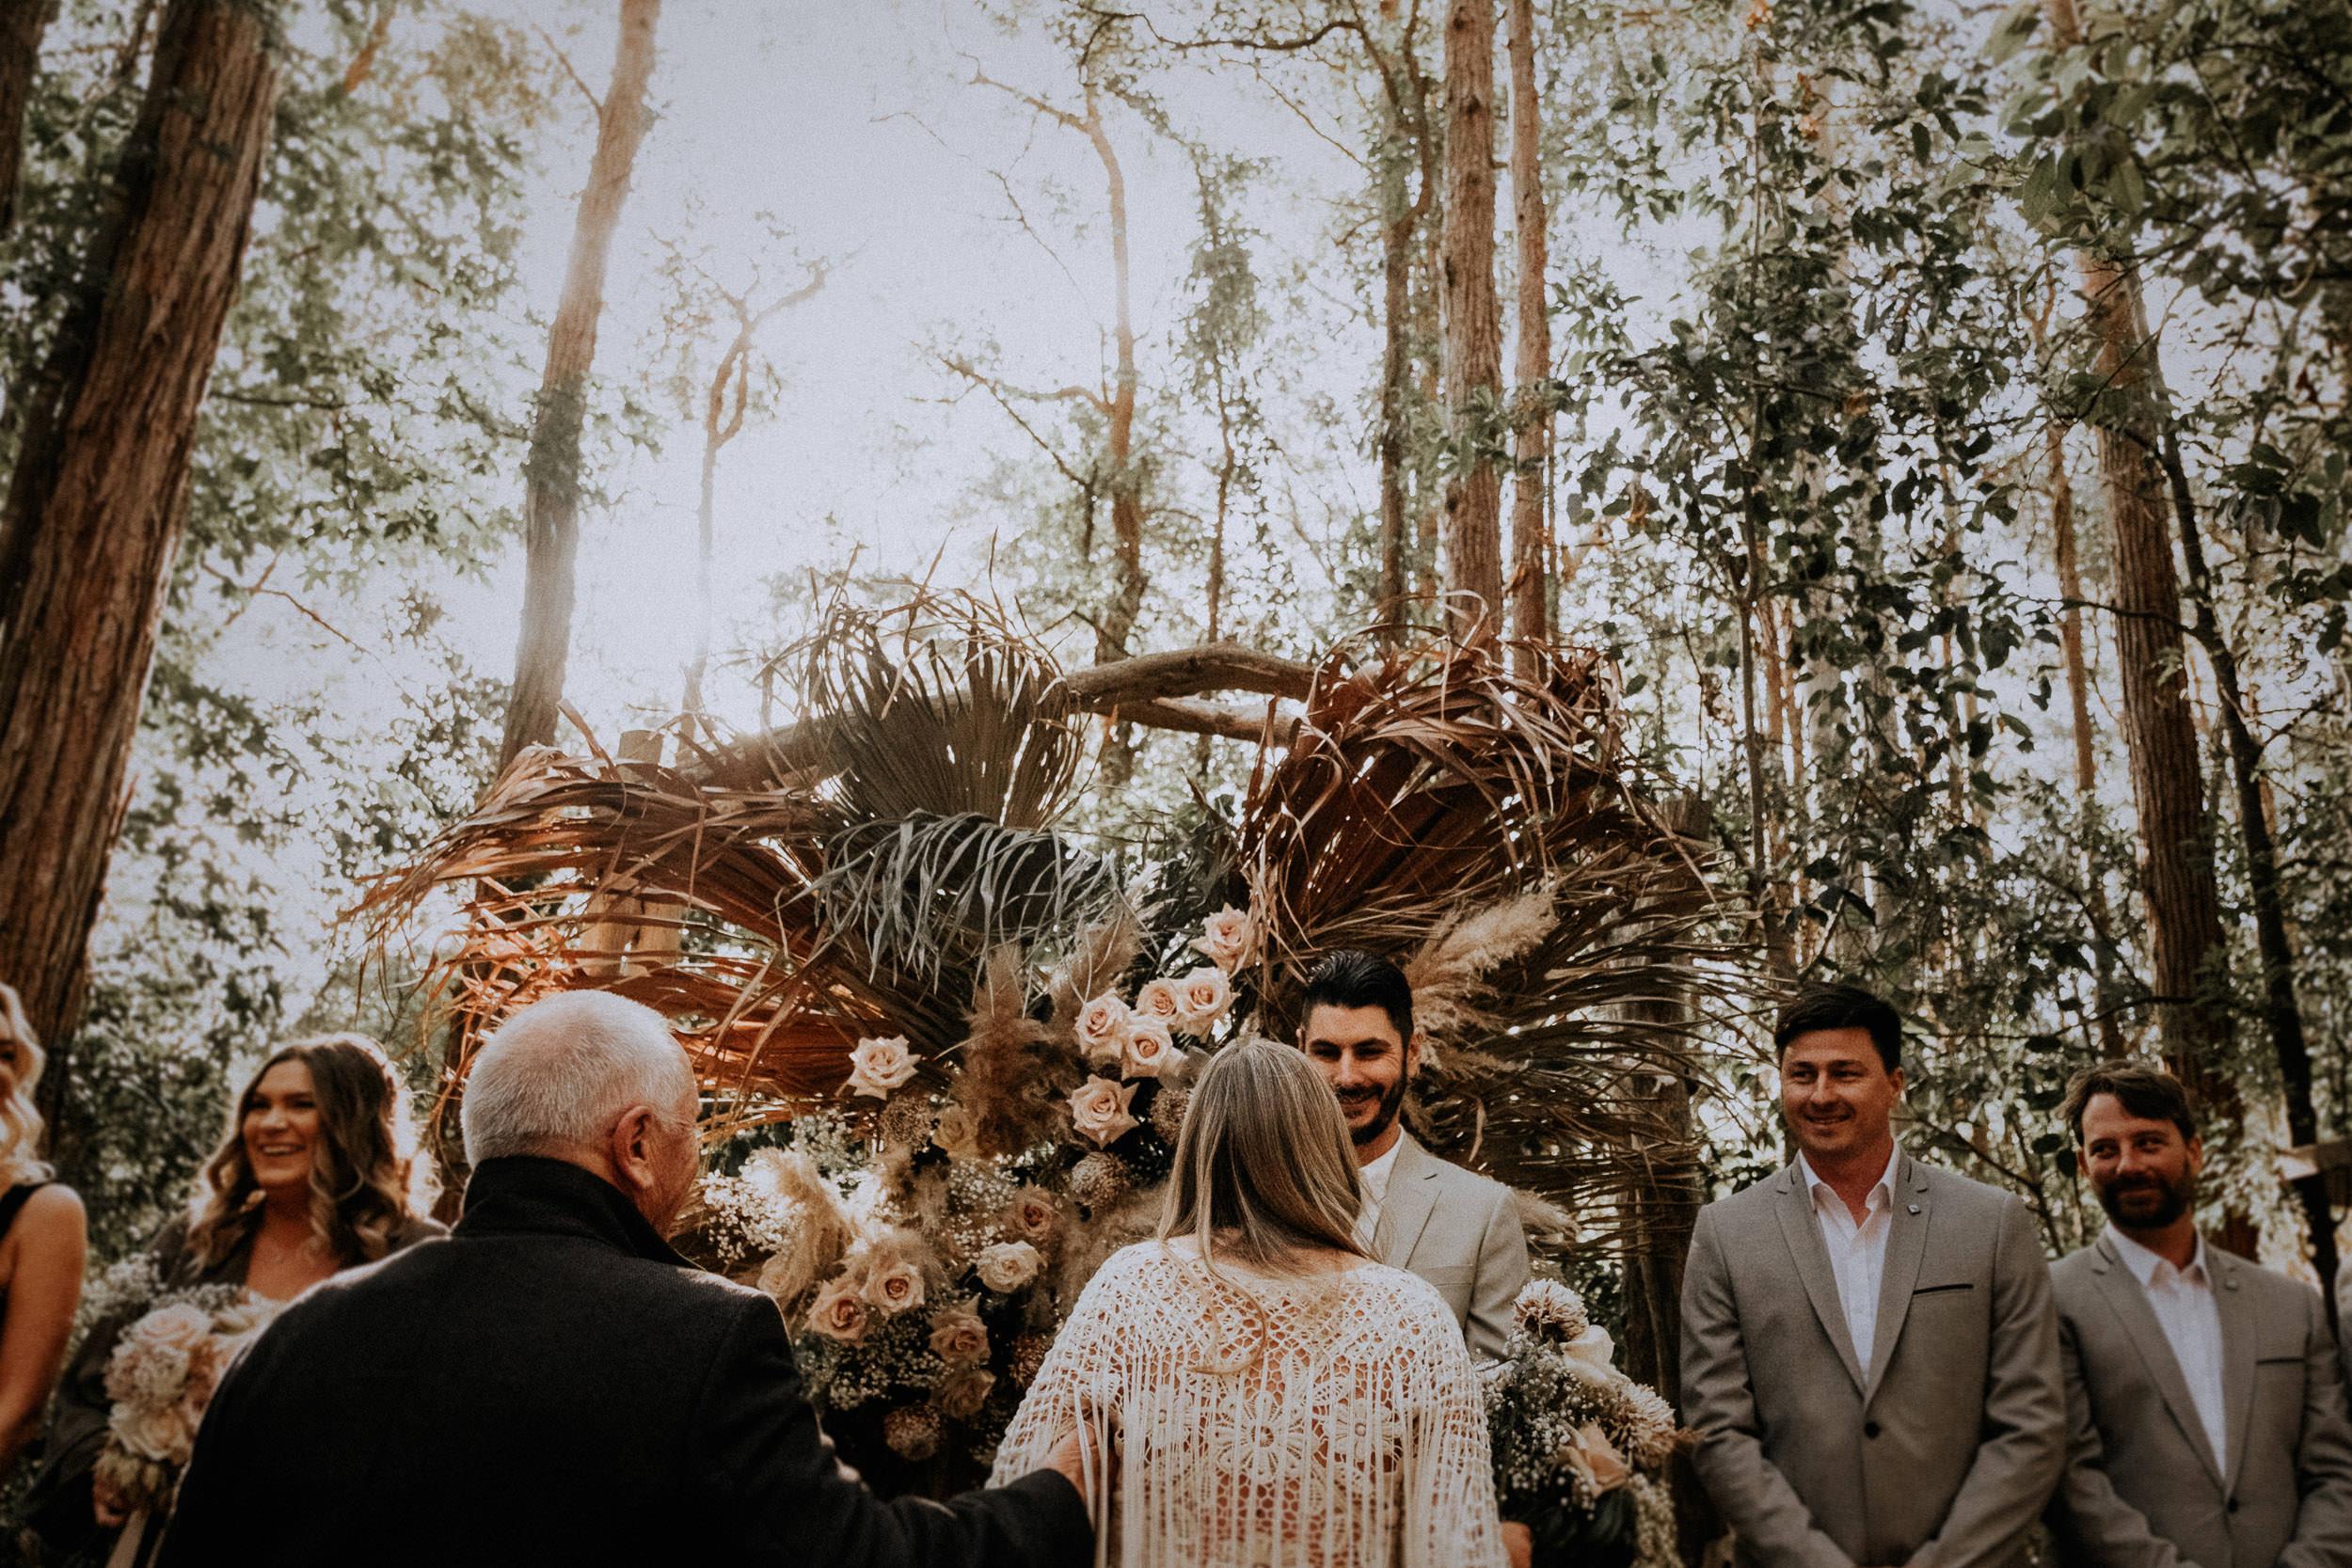 S&A Elopement - Kings & Thieves - Shred 'Til Dead - Central Coast Beach Forest Wedding - 170.jpg